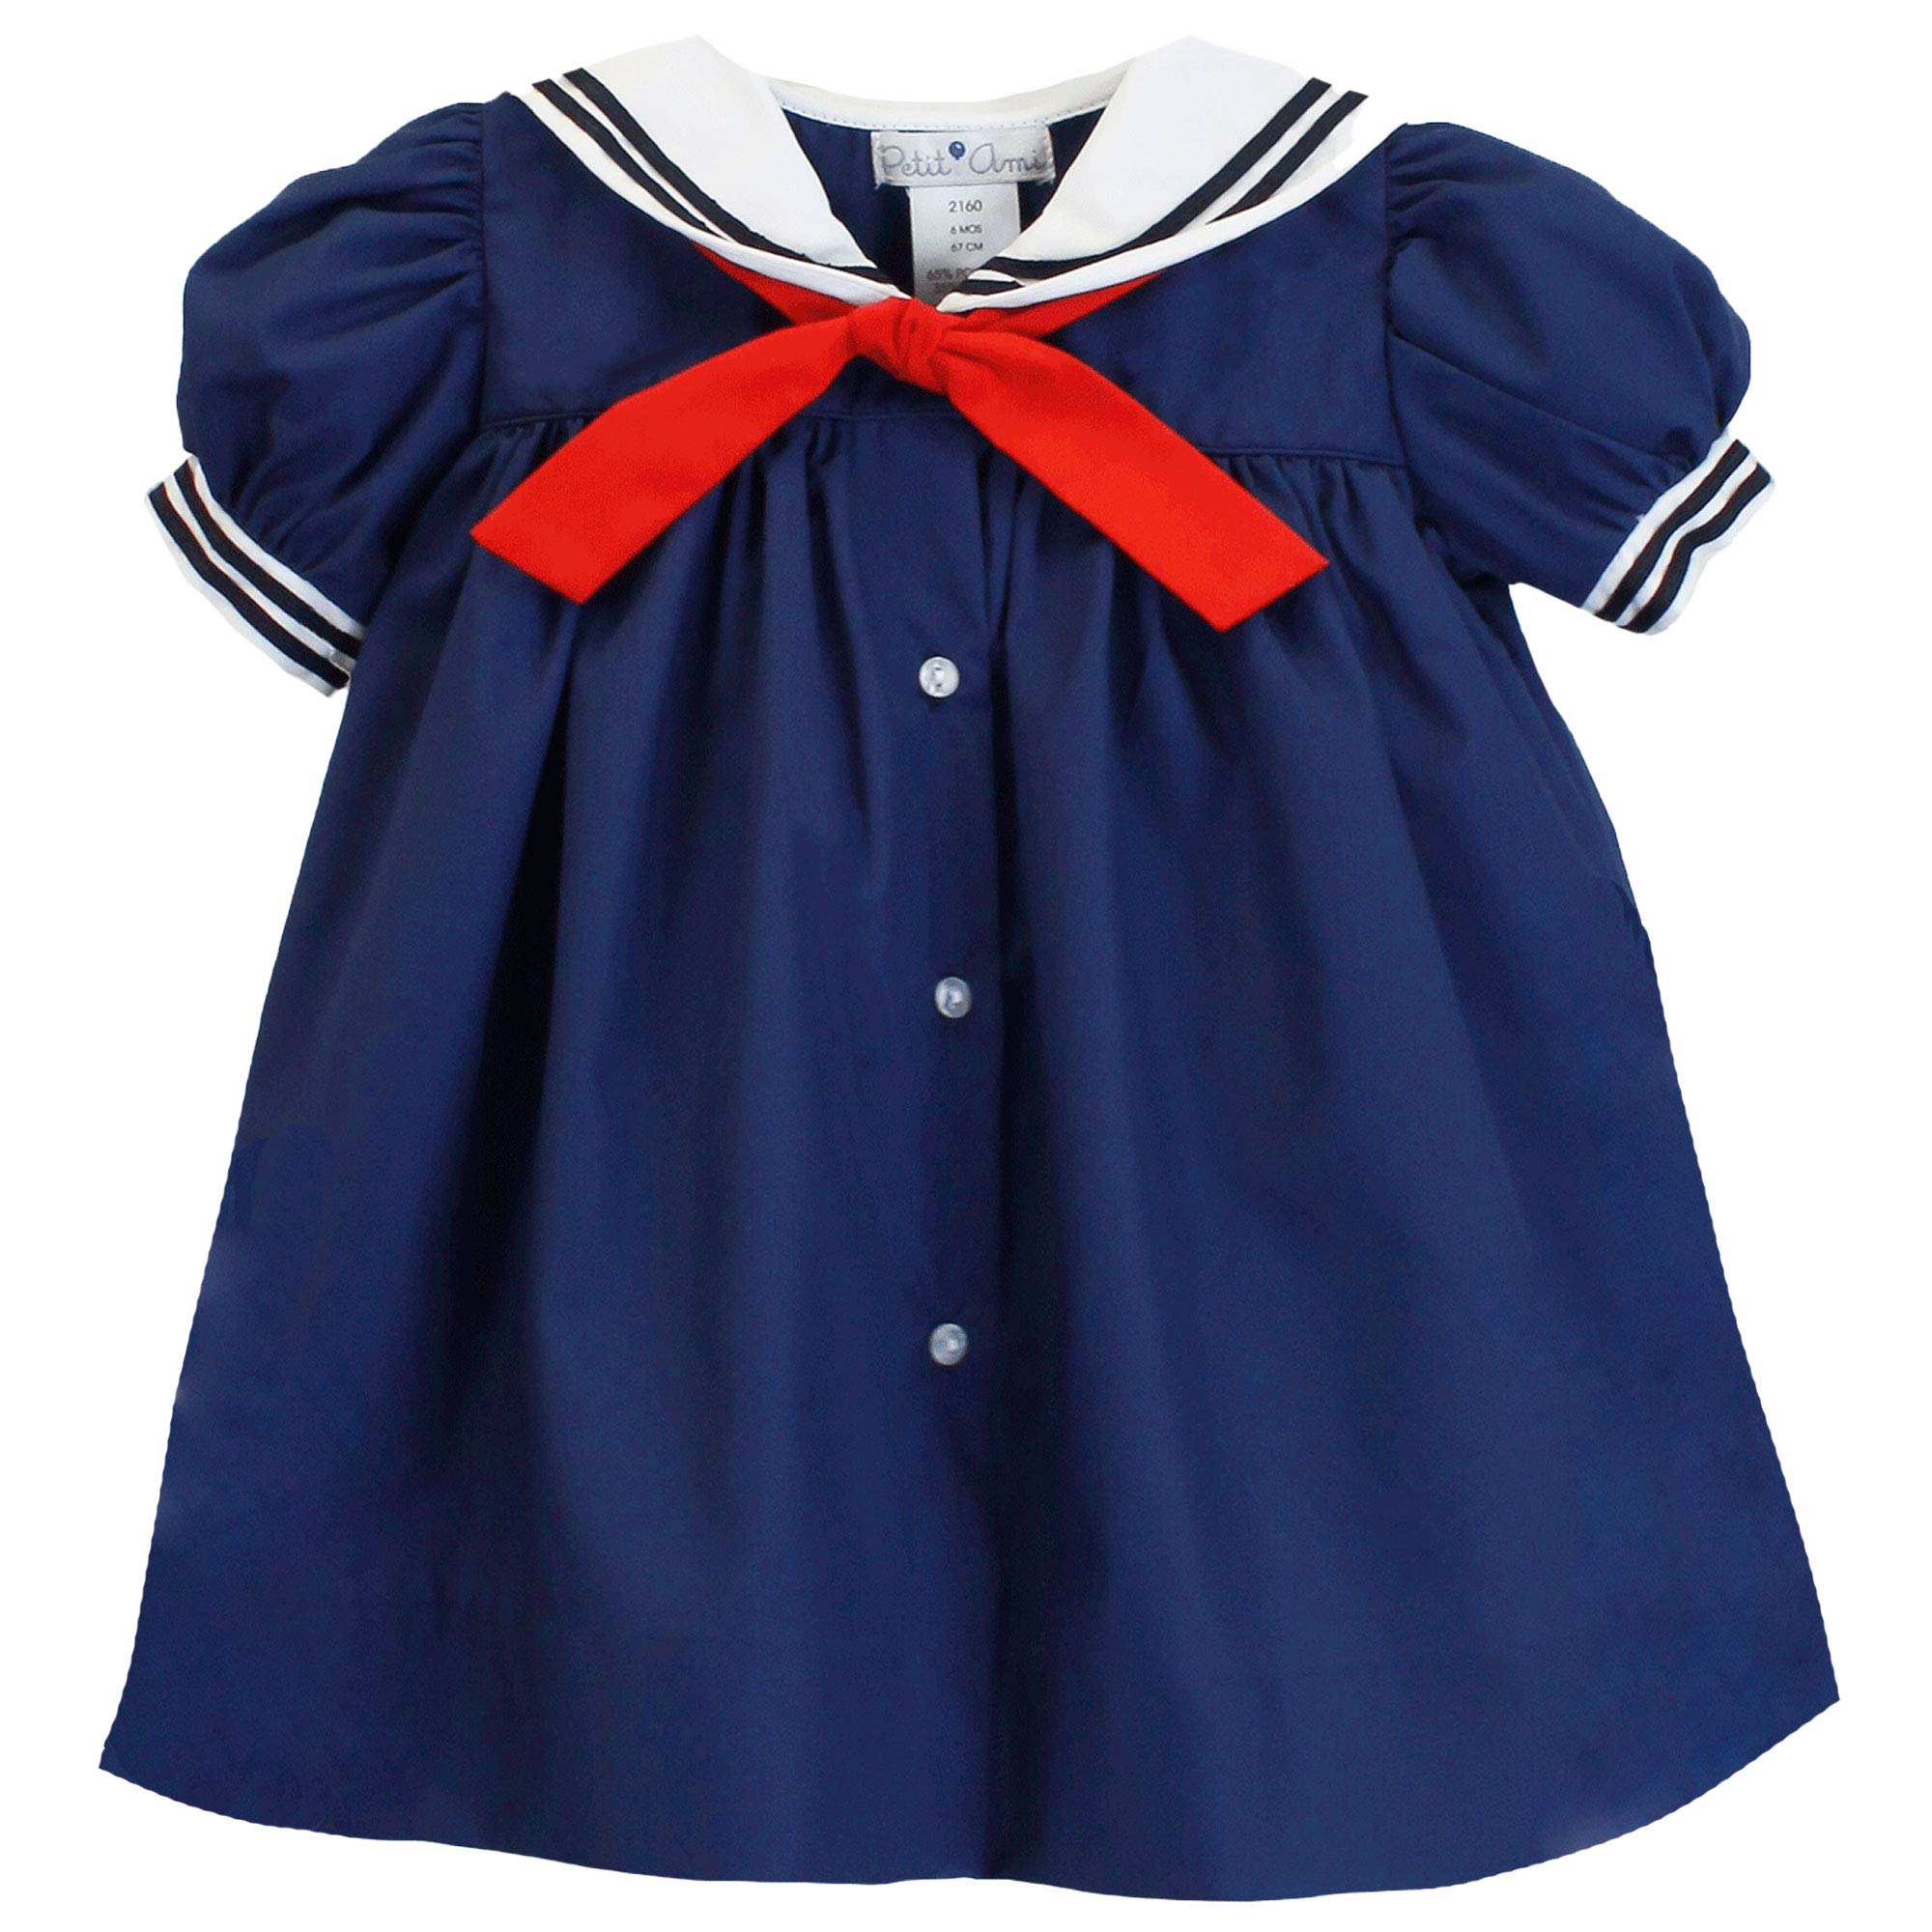 Petit Ami Baby Girls' Nautical Dress with Collar